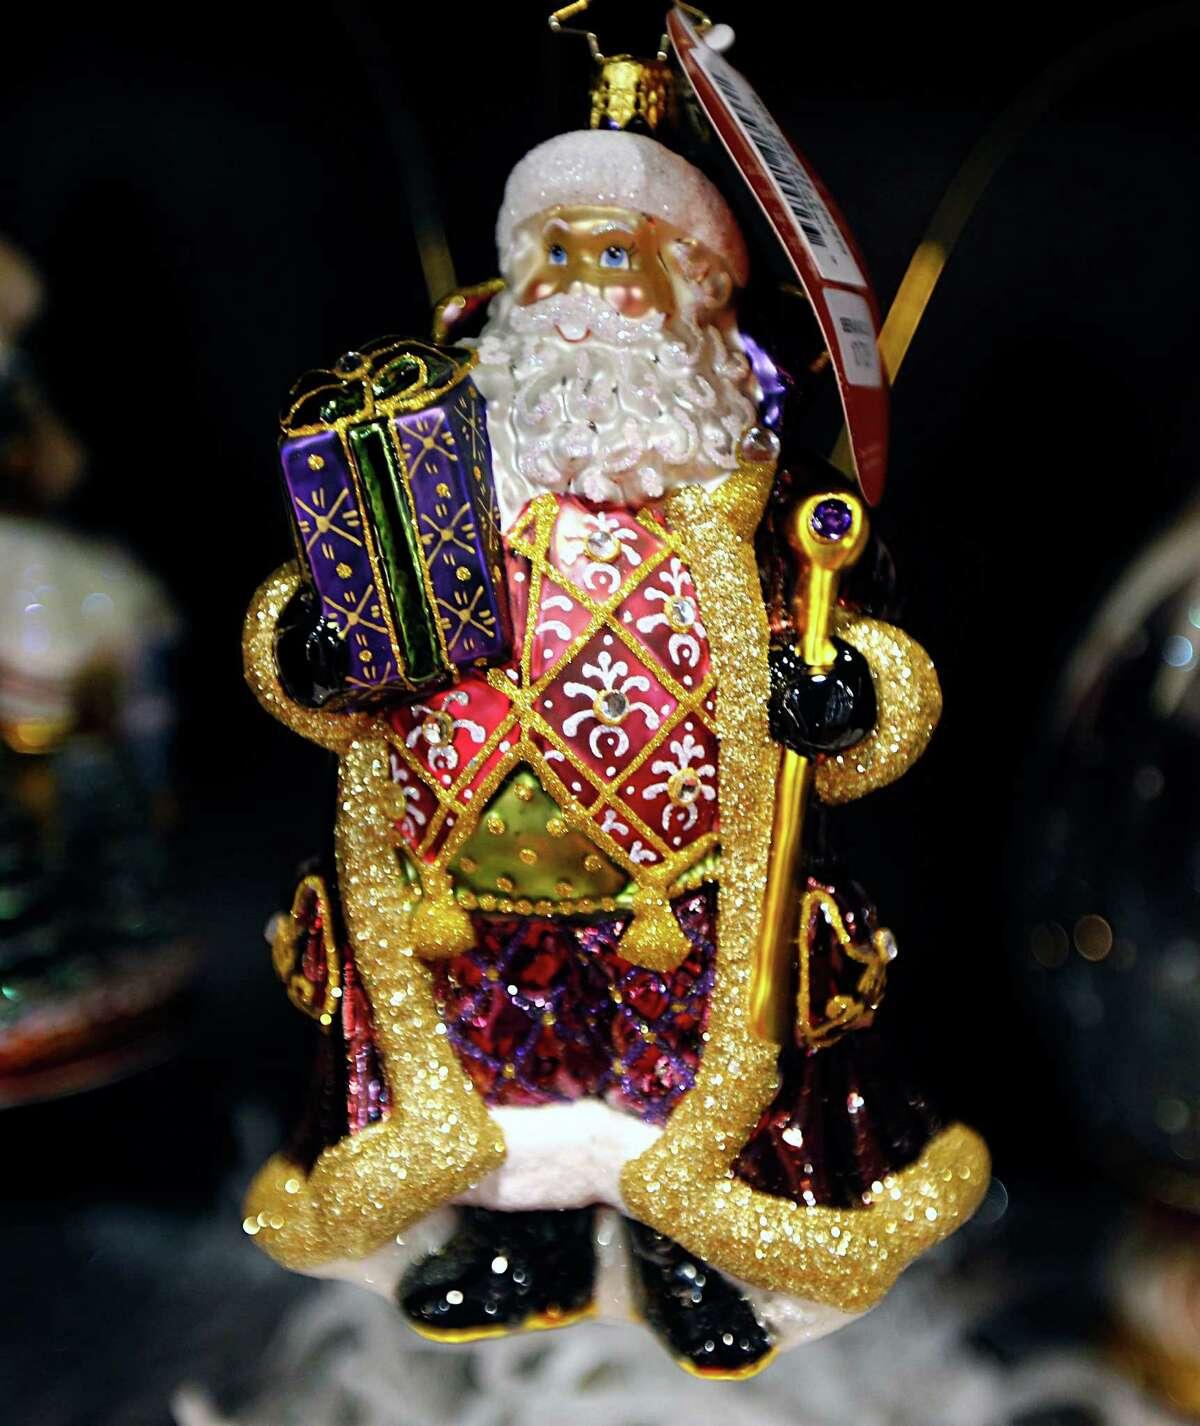 A Christmas ornament for sale at The Nutcracker Market's Ornament Barre Monday, Nov. 9, 2015, in Houston. ( James Nielsen / Houston Chronicle )